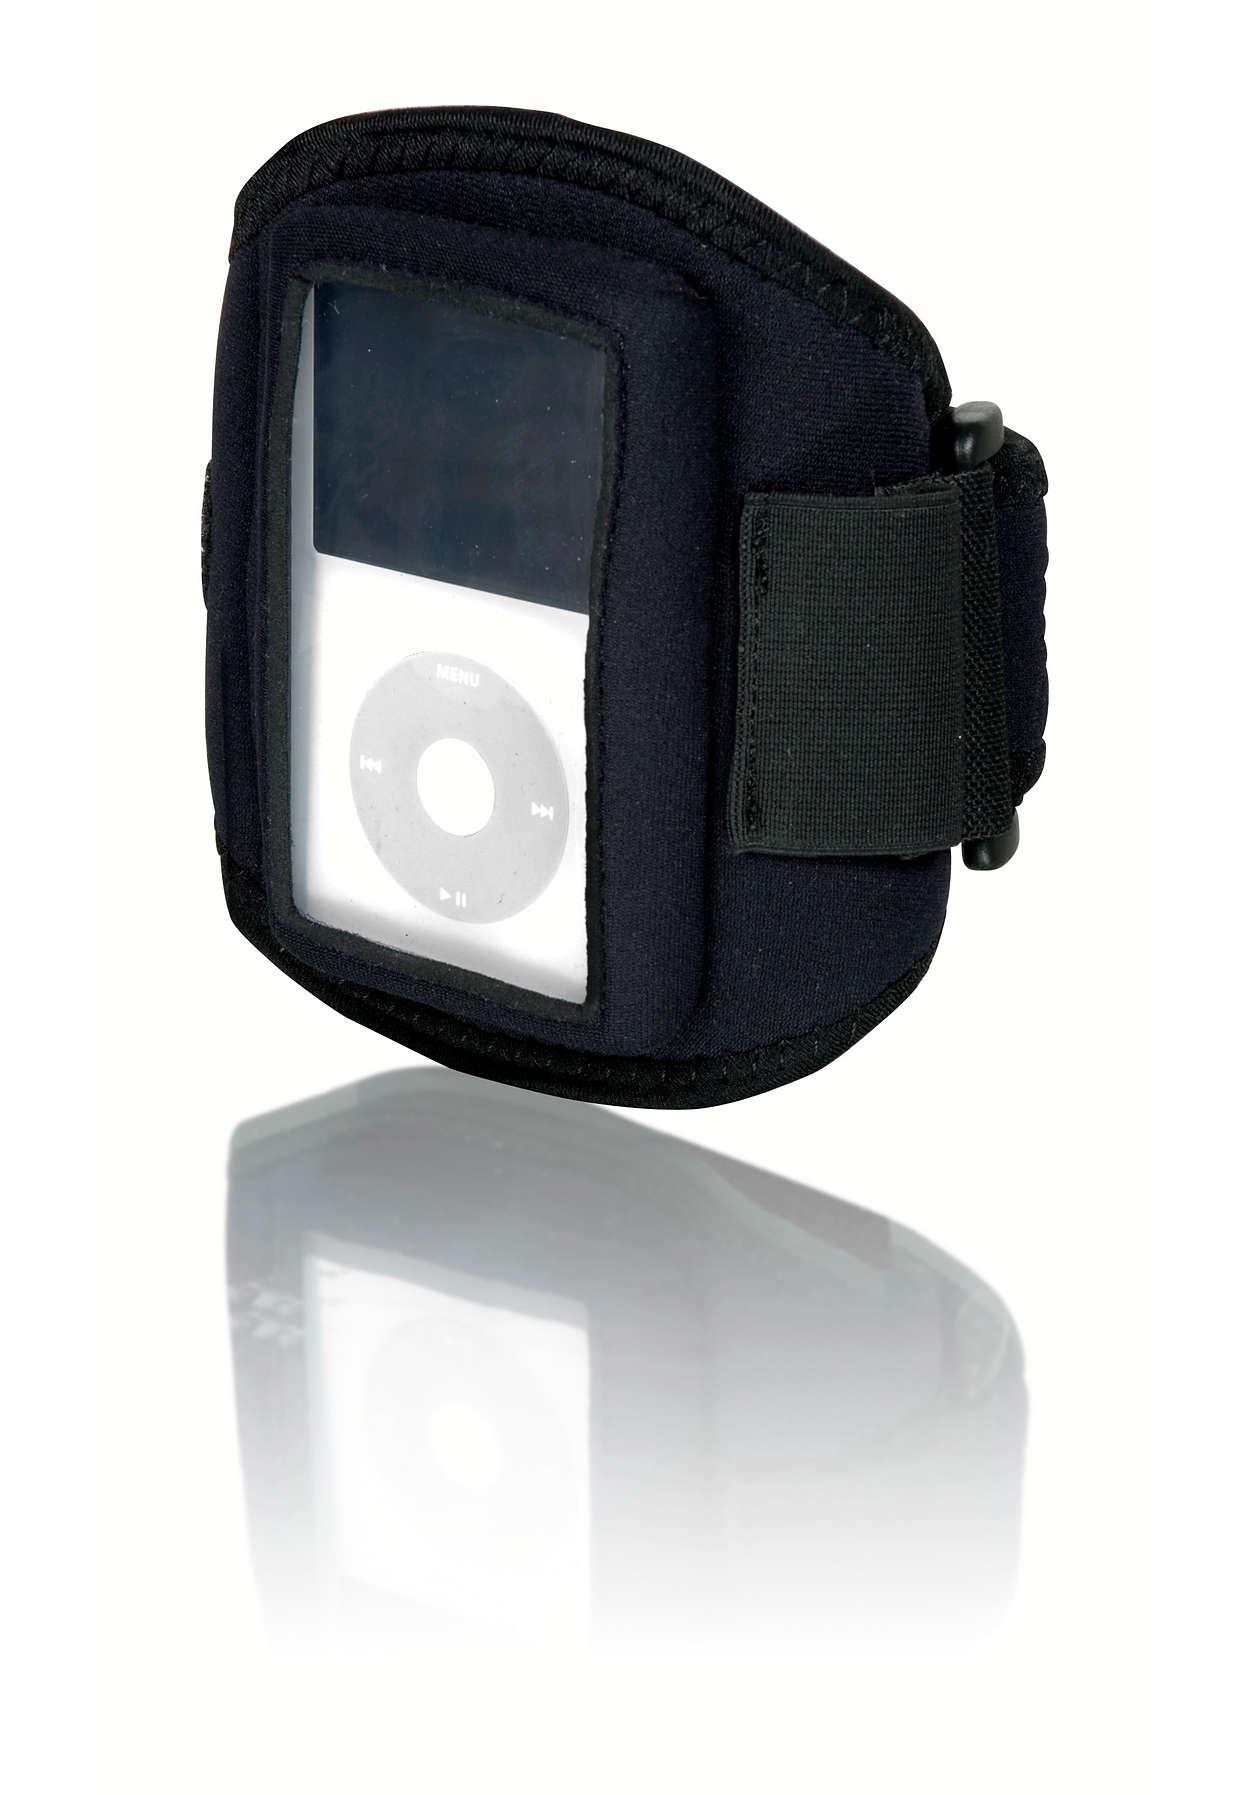 Тренировка с iPod Video